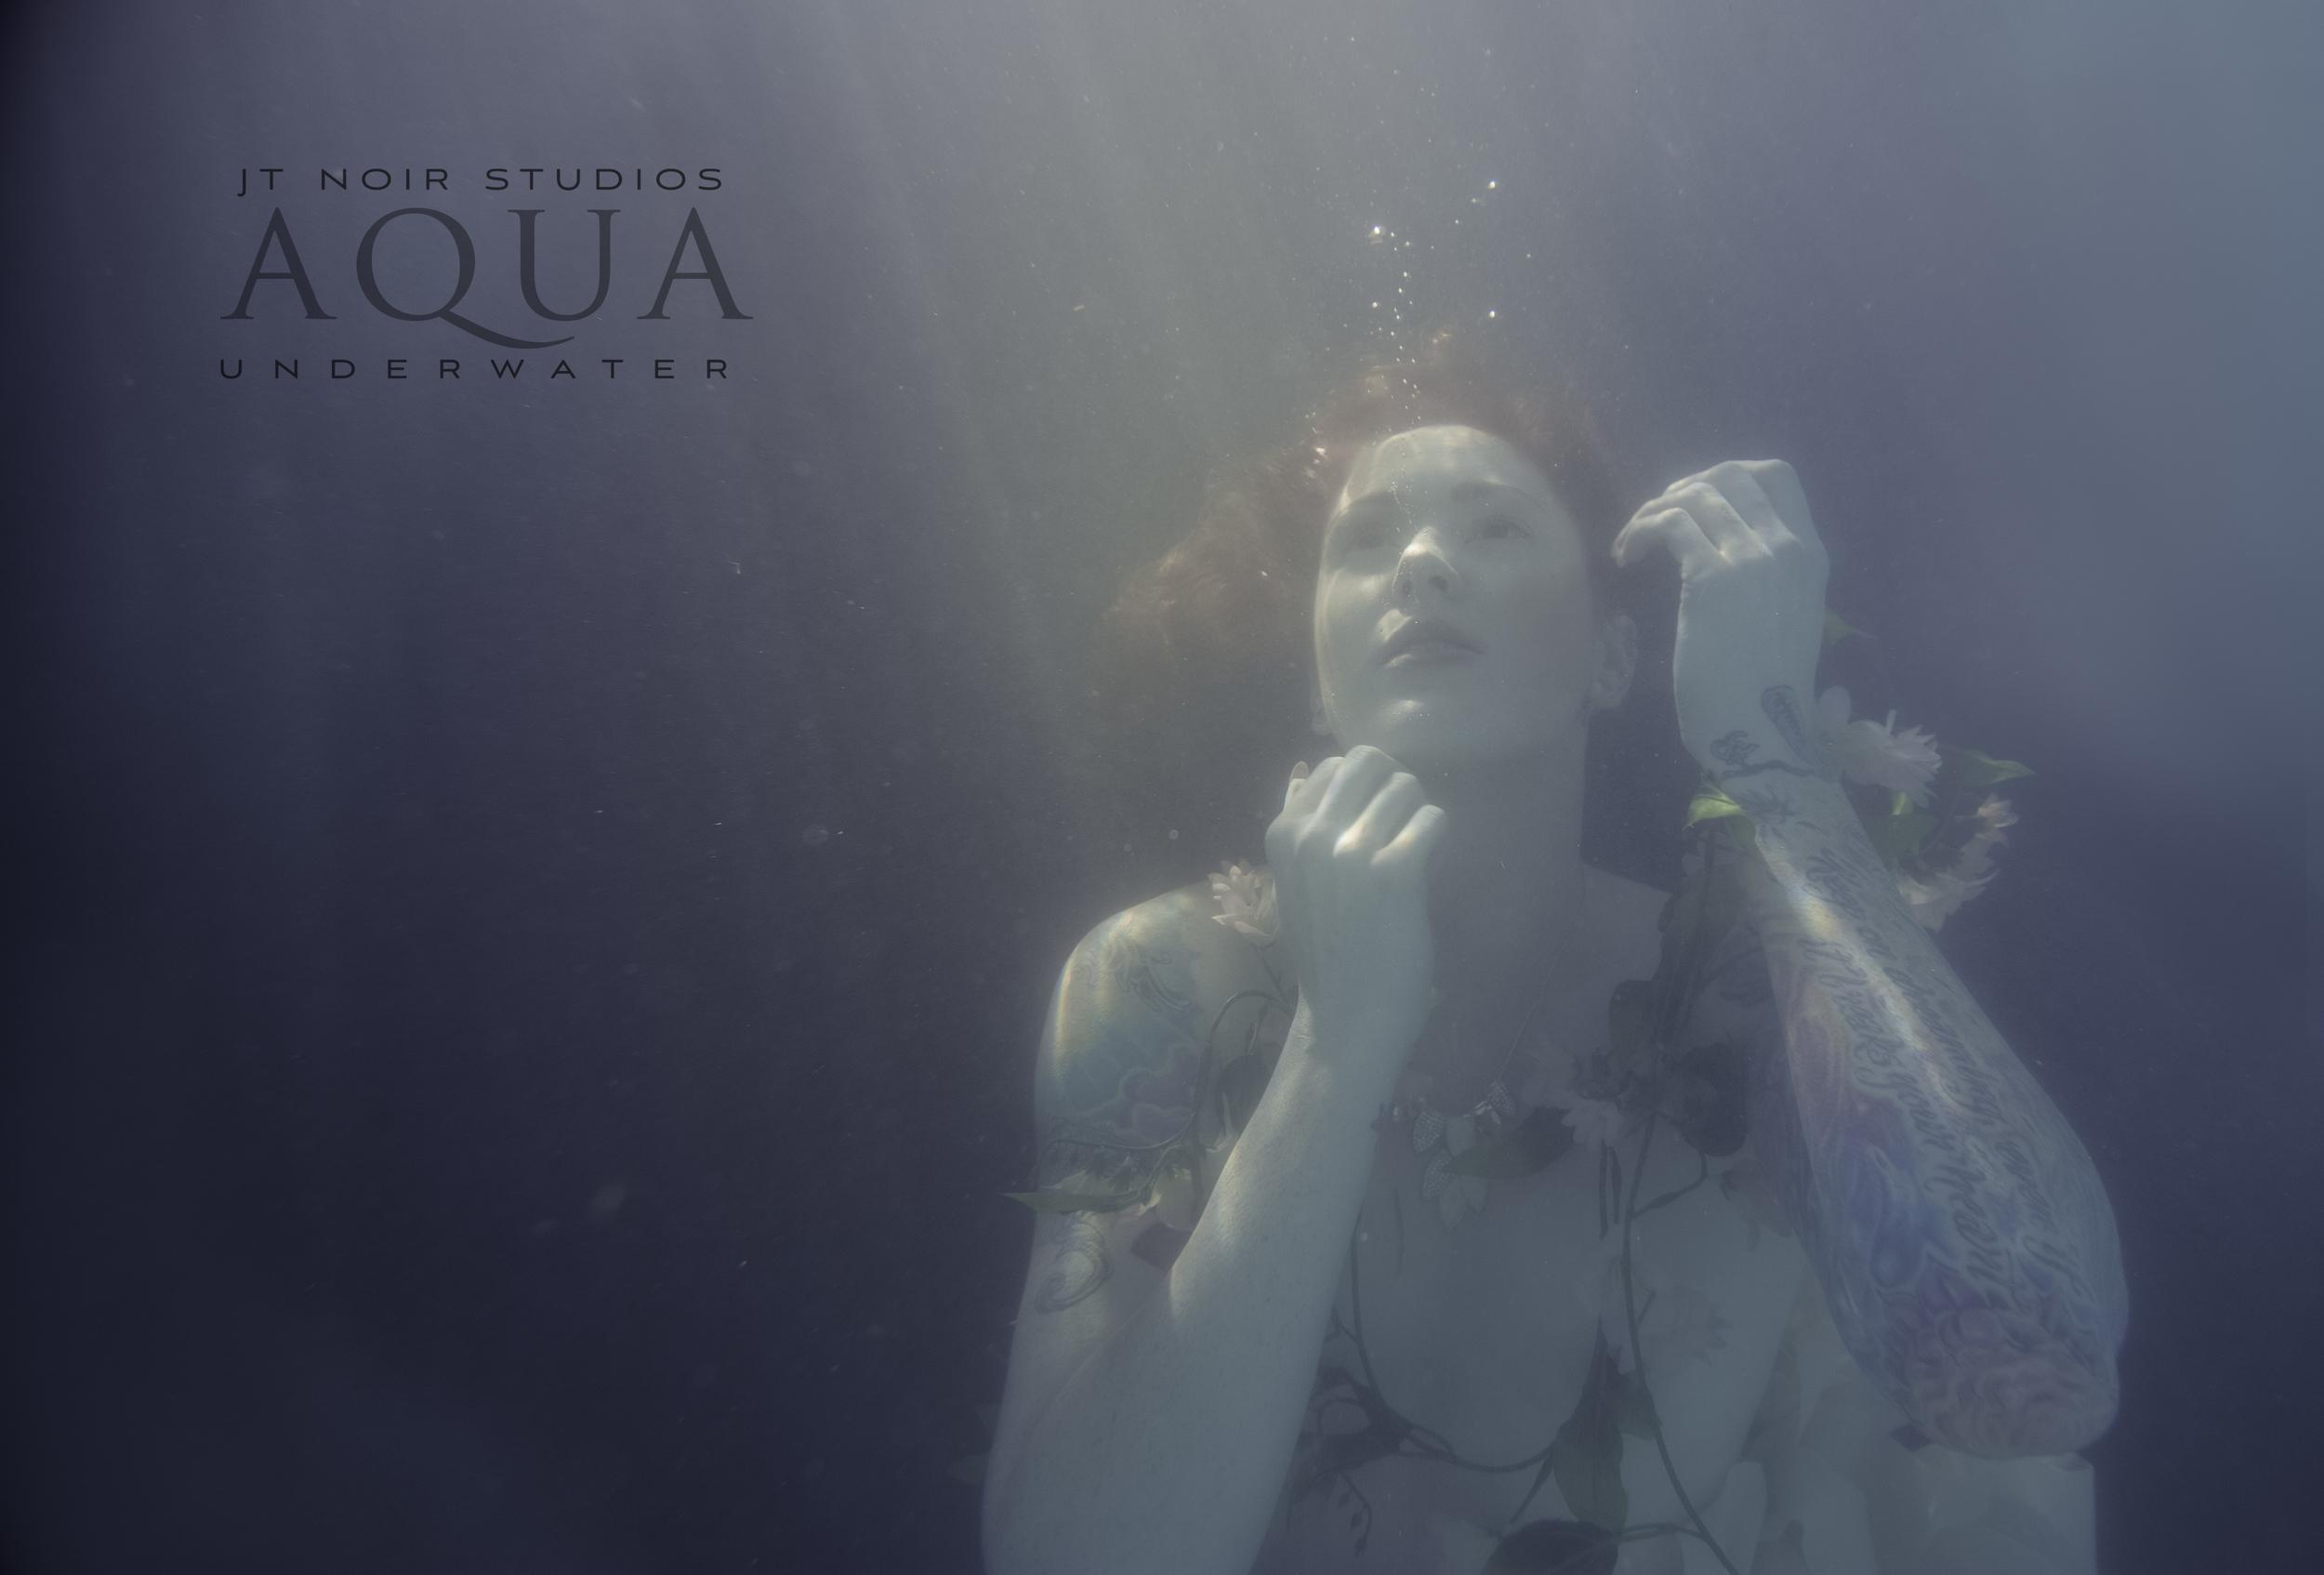 JTAqua_underwater_HopeRobb_Nude_Boudoir_fineart_2016-.jpg